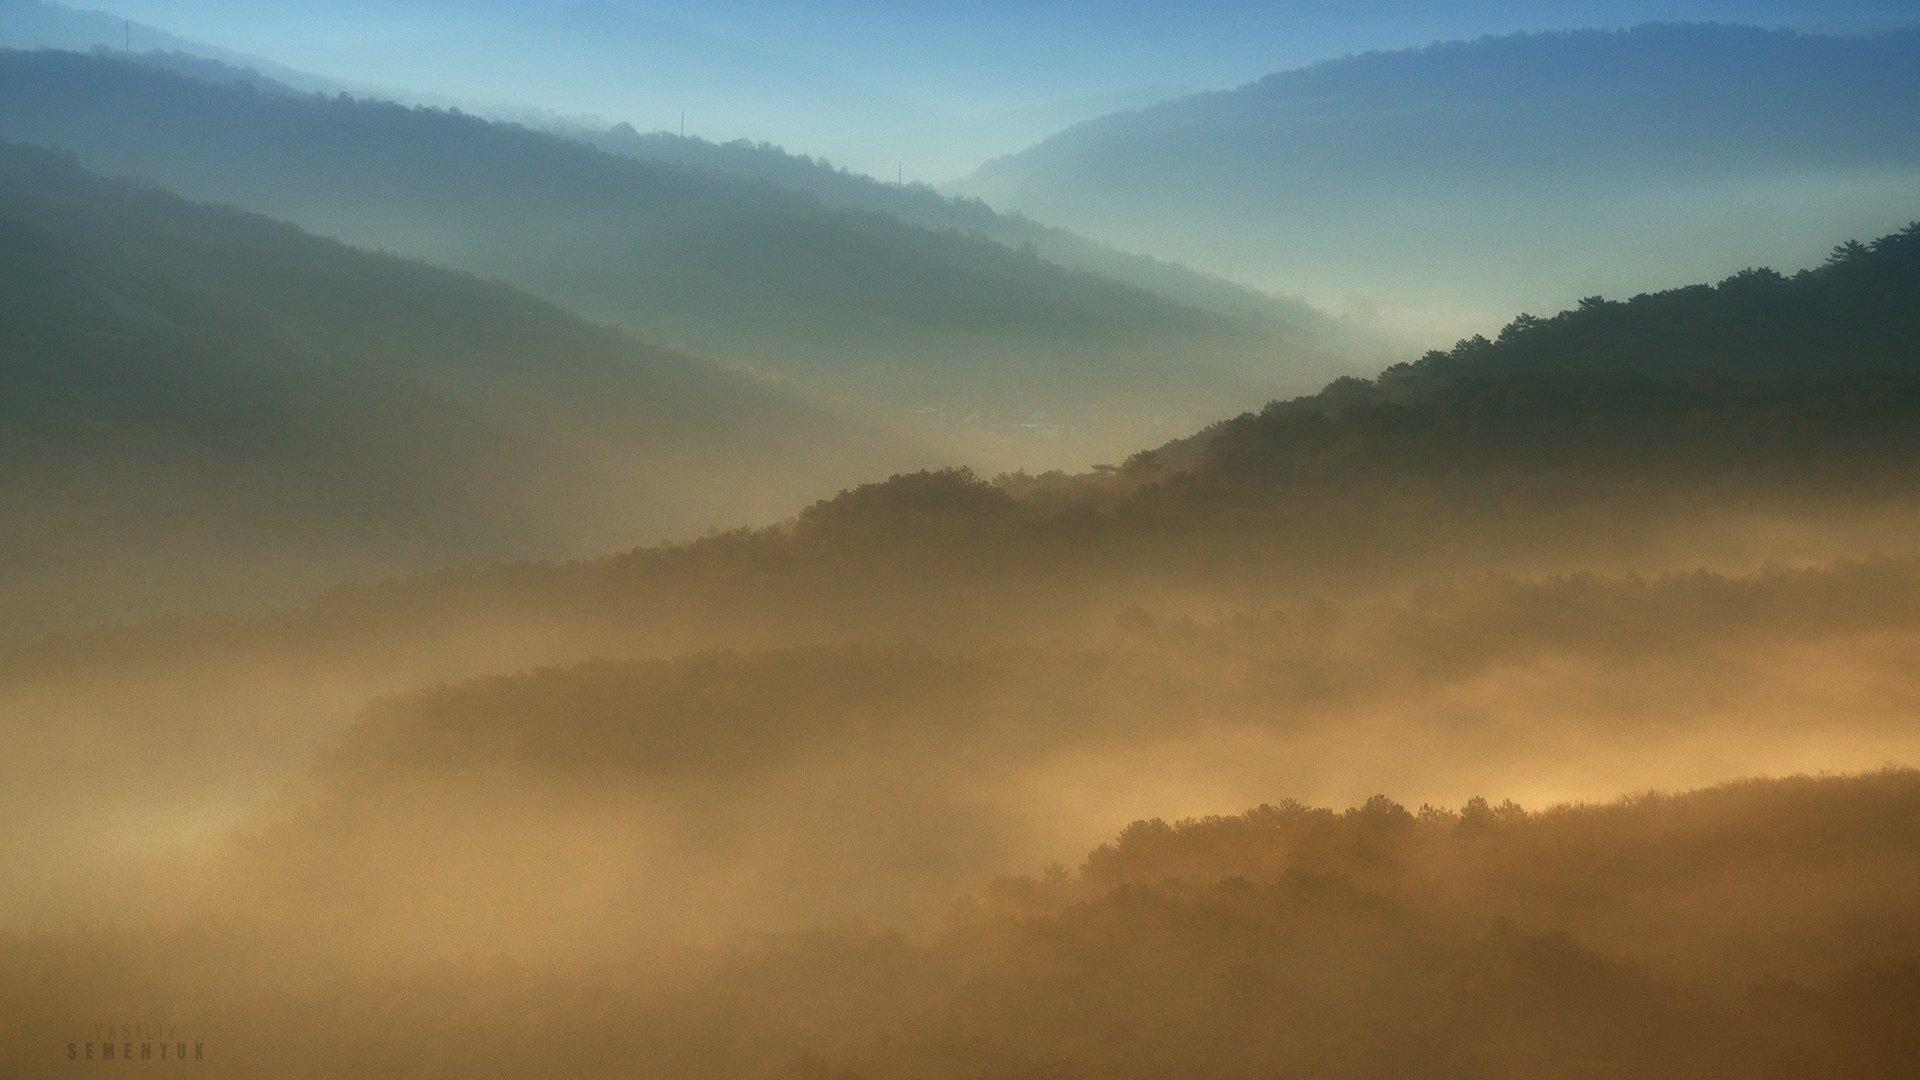 крым, весна, рассвет, горы, туман, кача, mountain, minimalism, dawn, myst, fog, crimea., Семенюк Василий